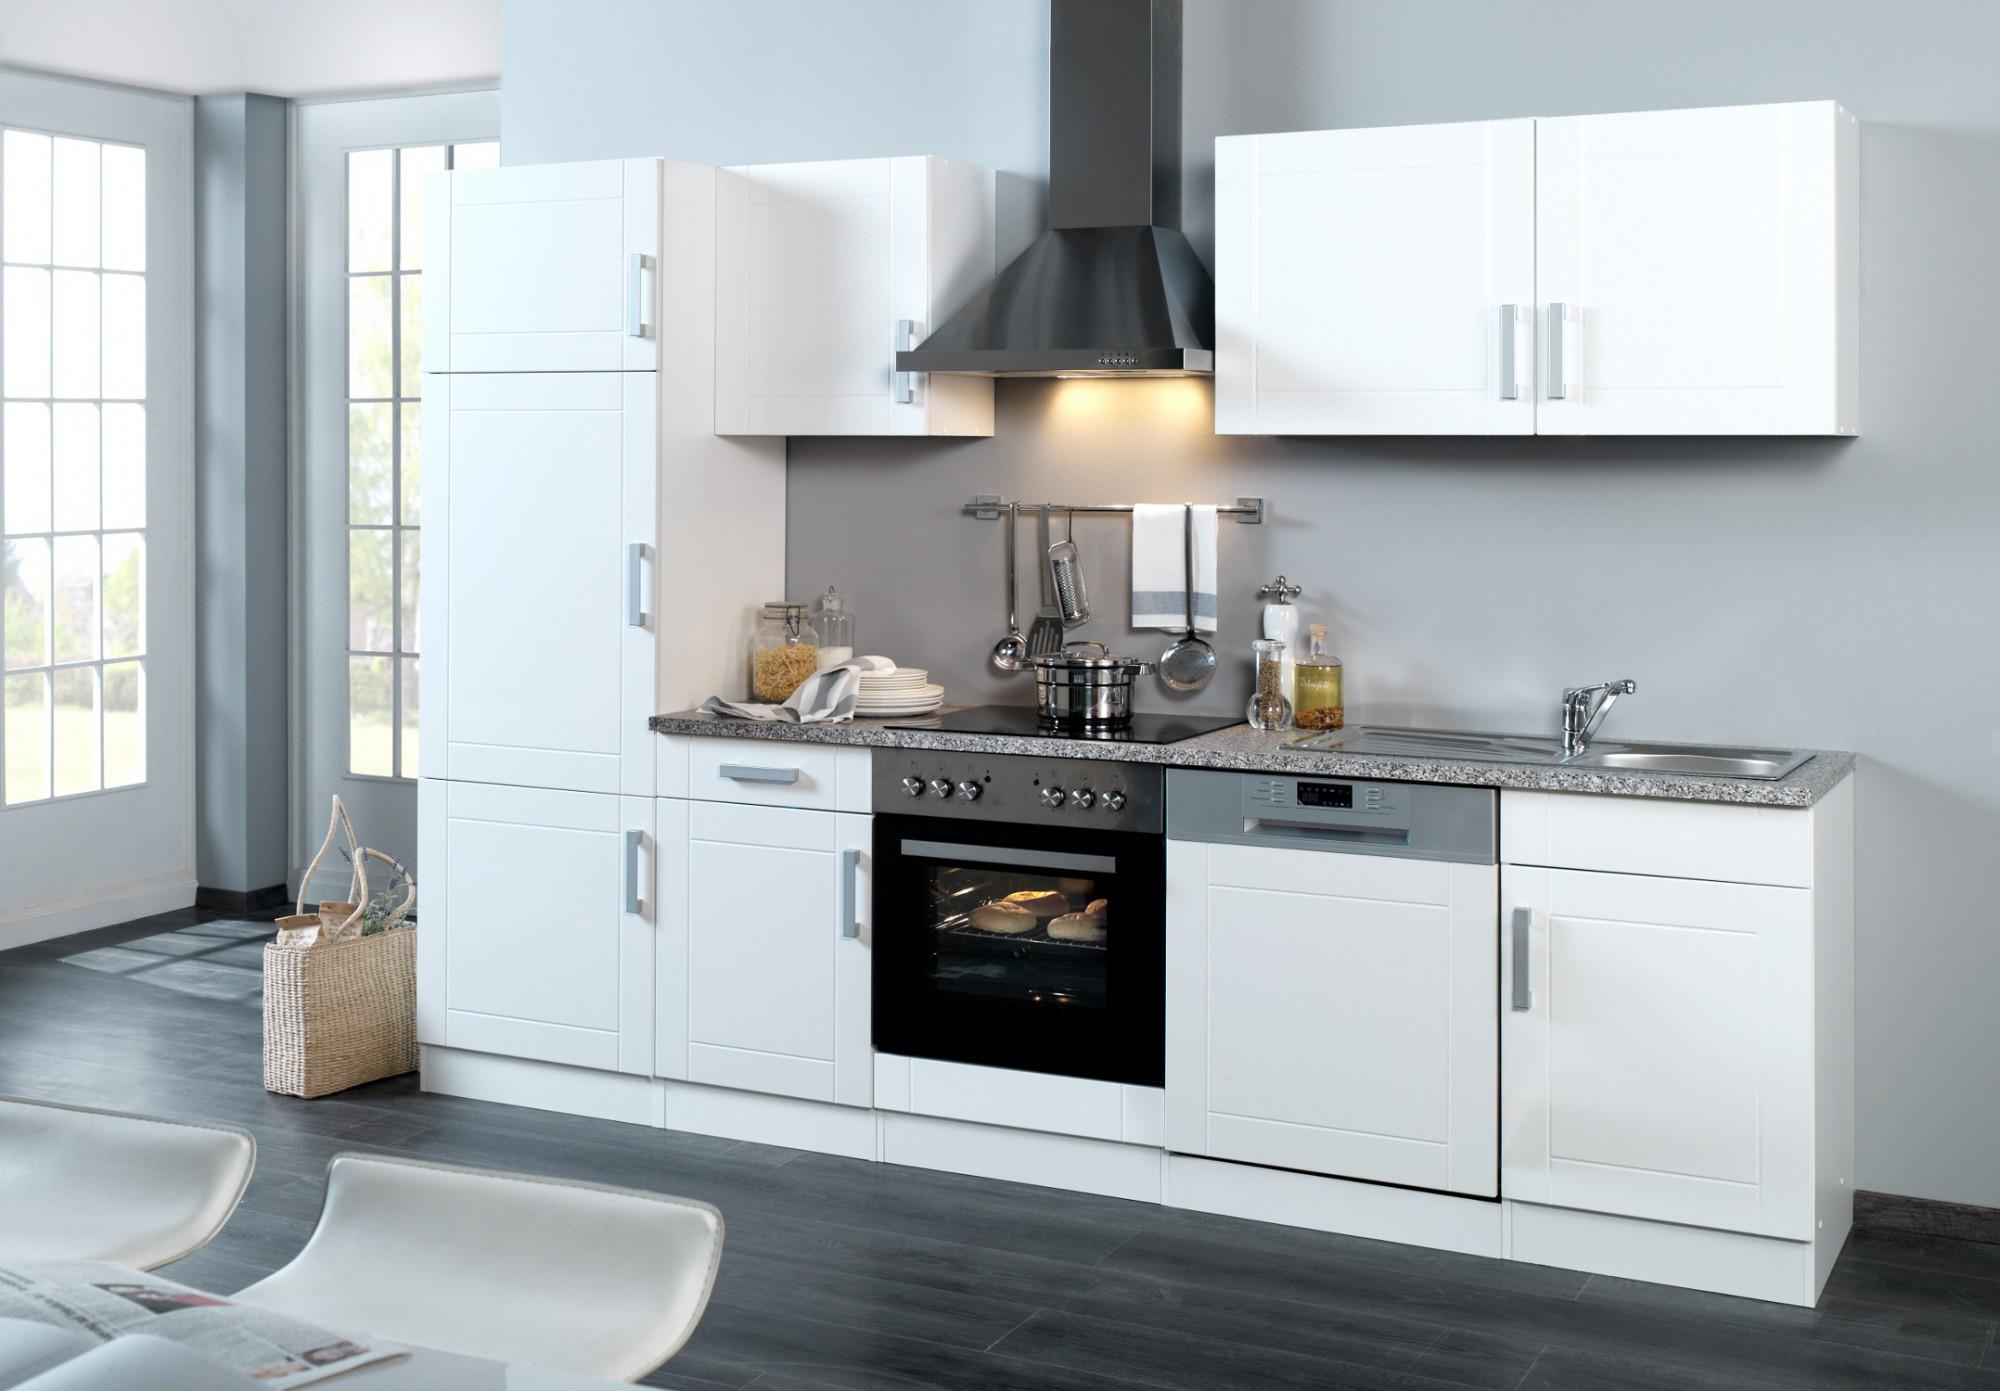 neu k chenzeile varel k chenblock mit e ger ten 280 cm. Black Bedroom Furniture Sets. Home Design Ideas